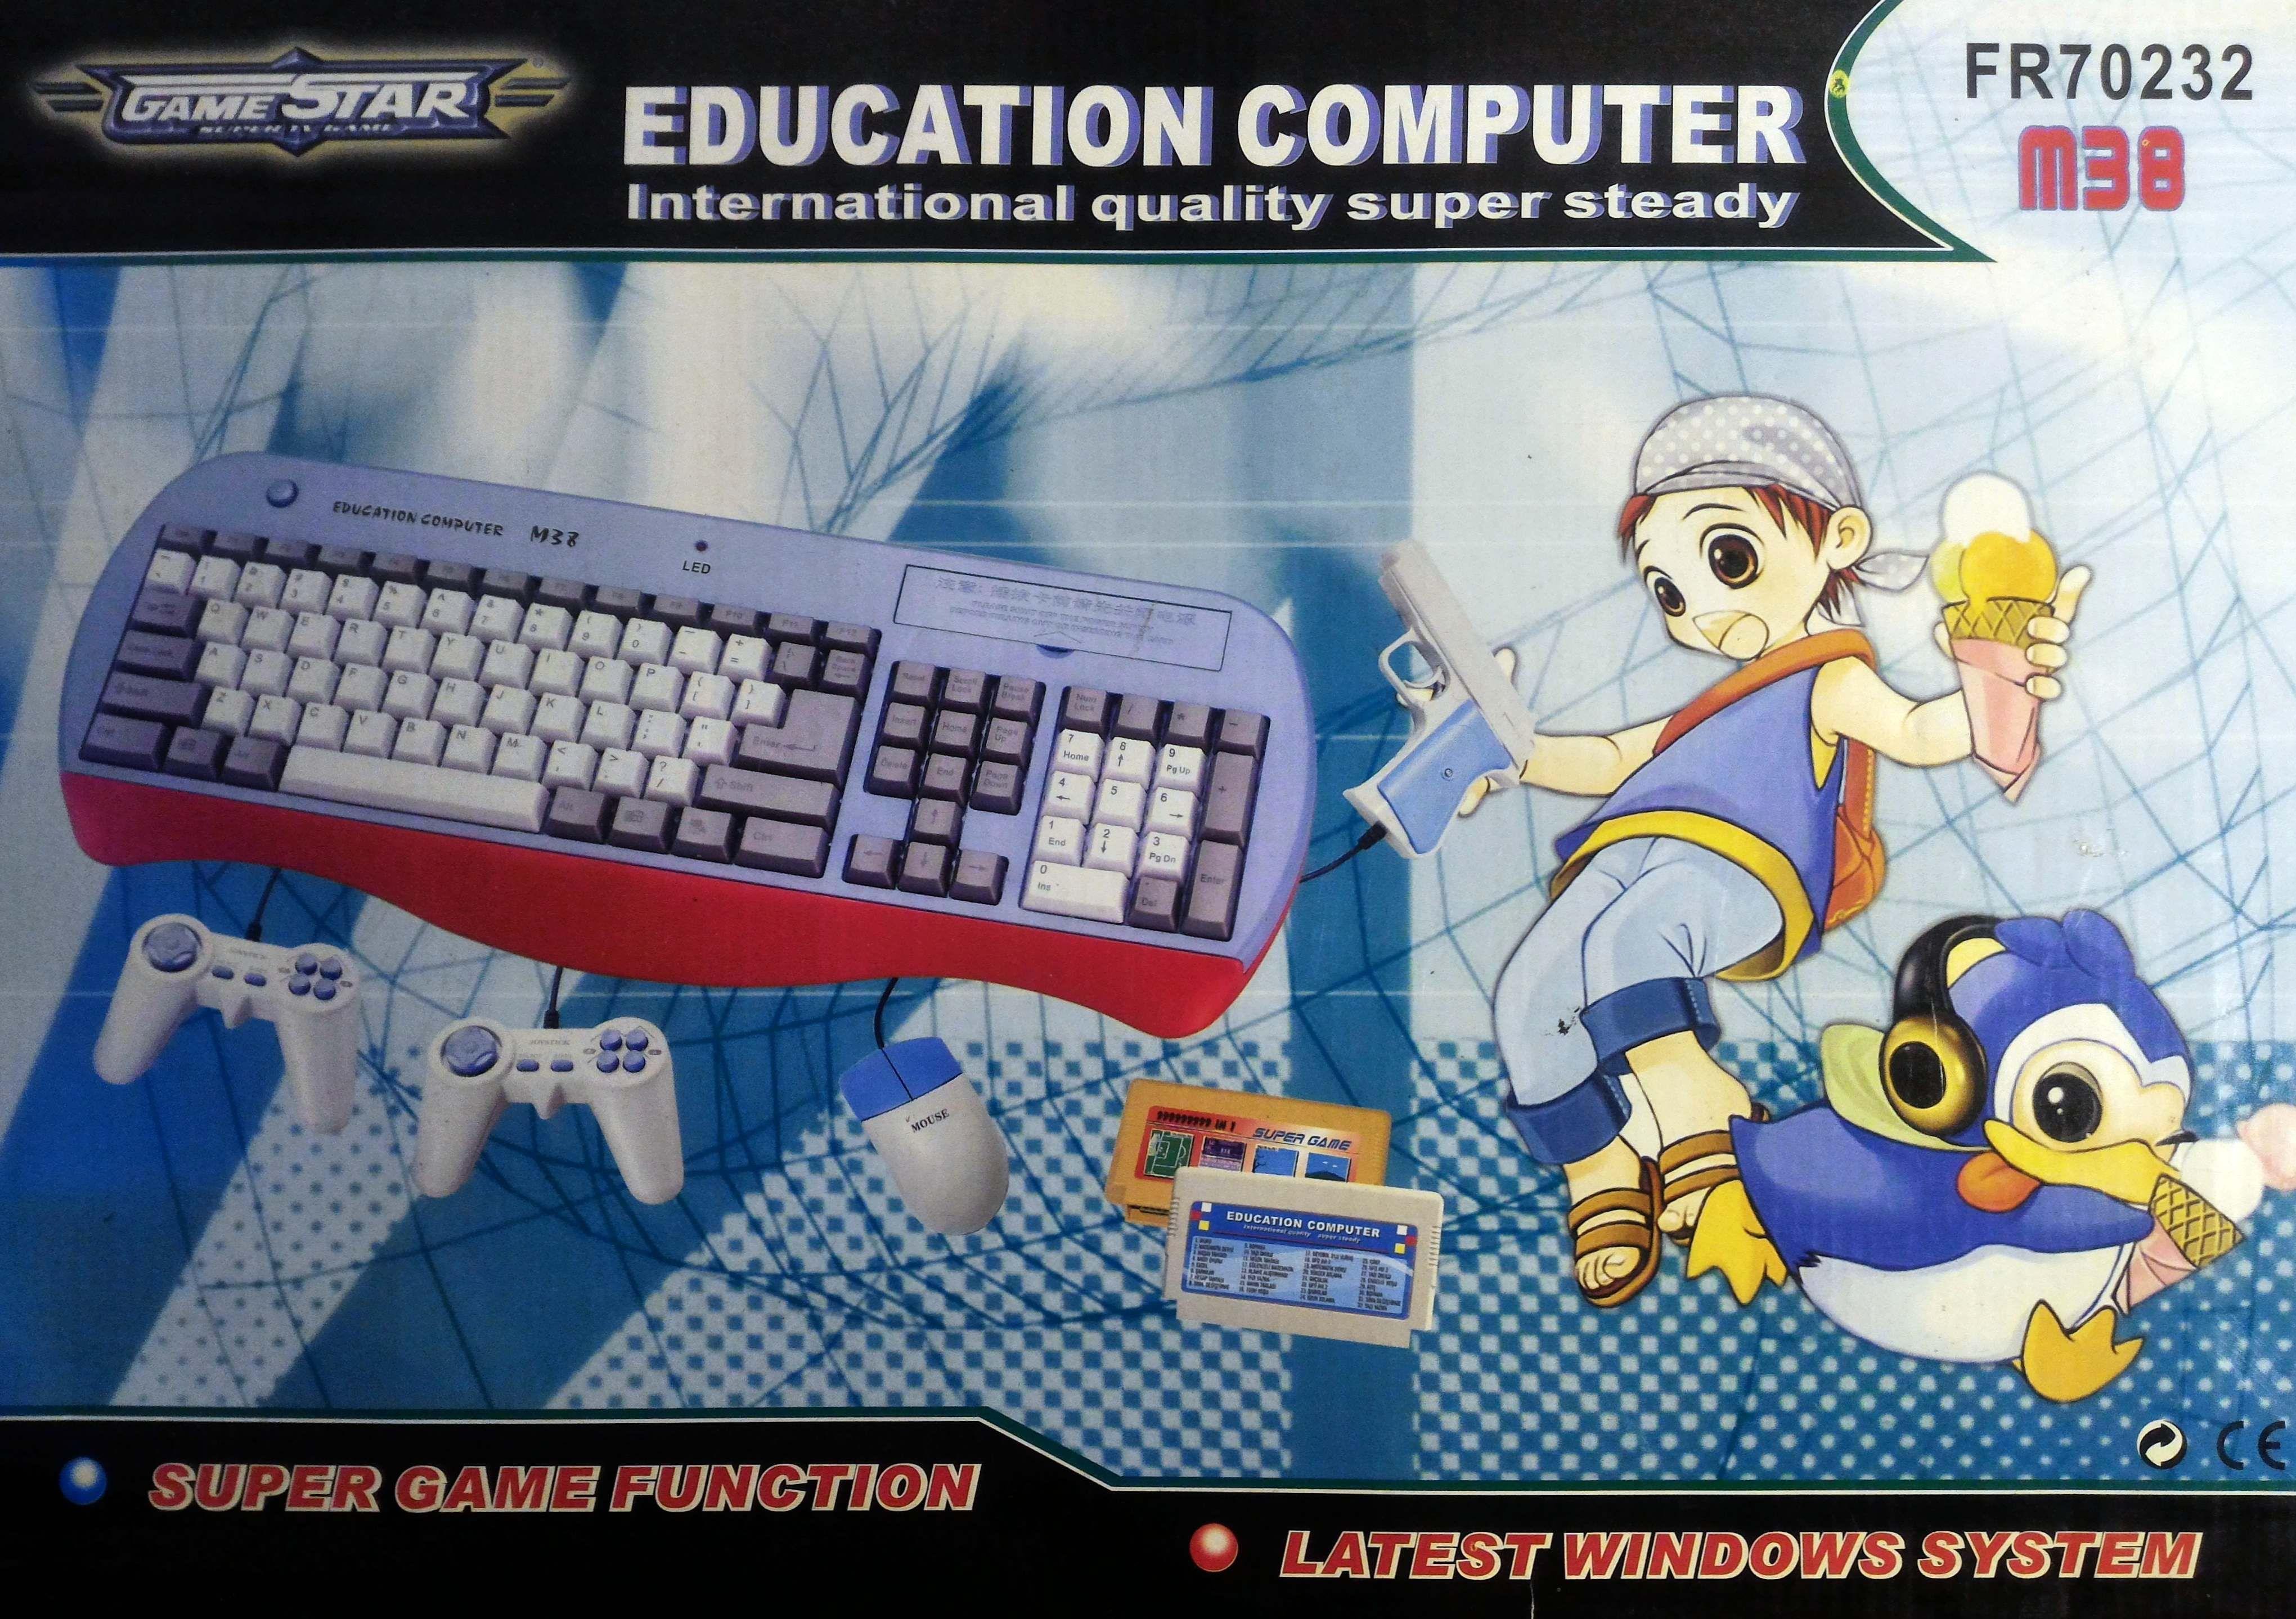 gamestar hardware